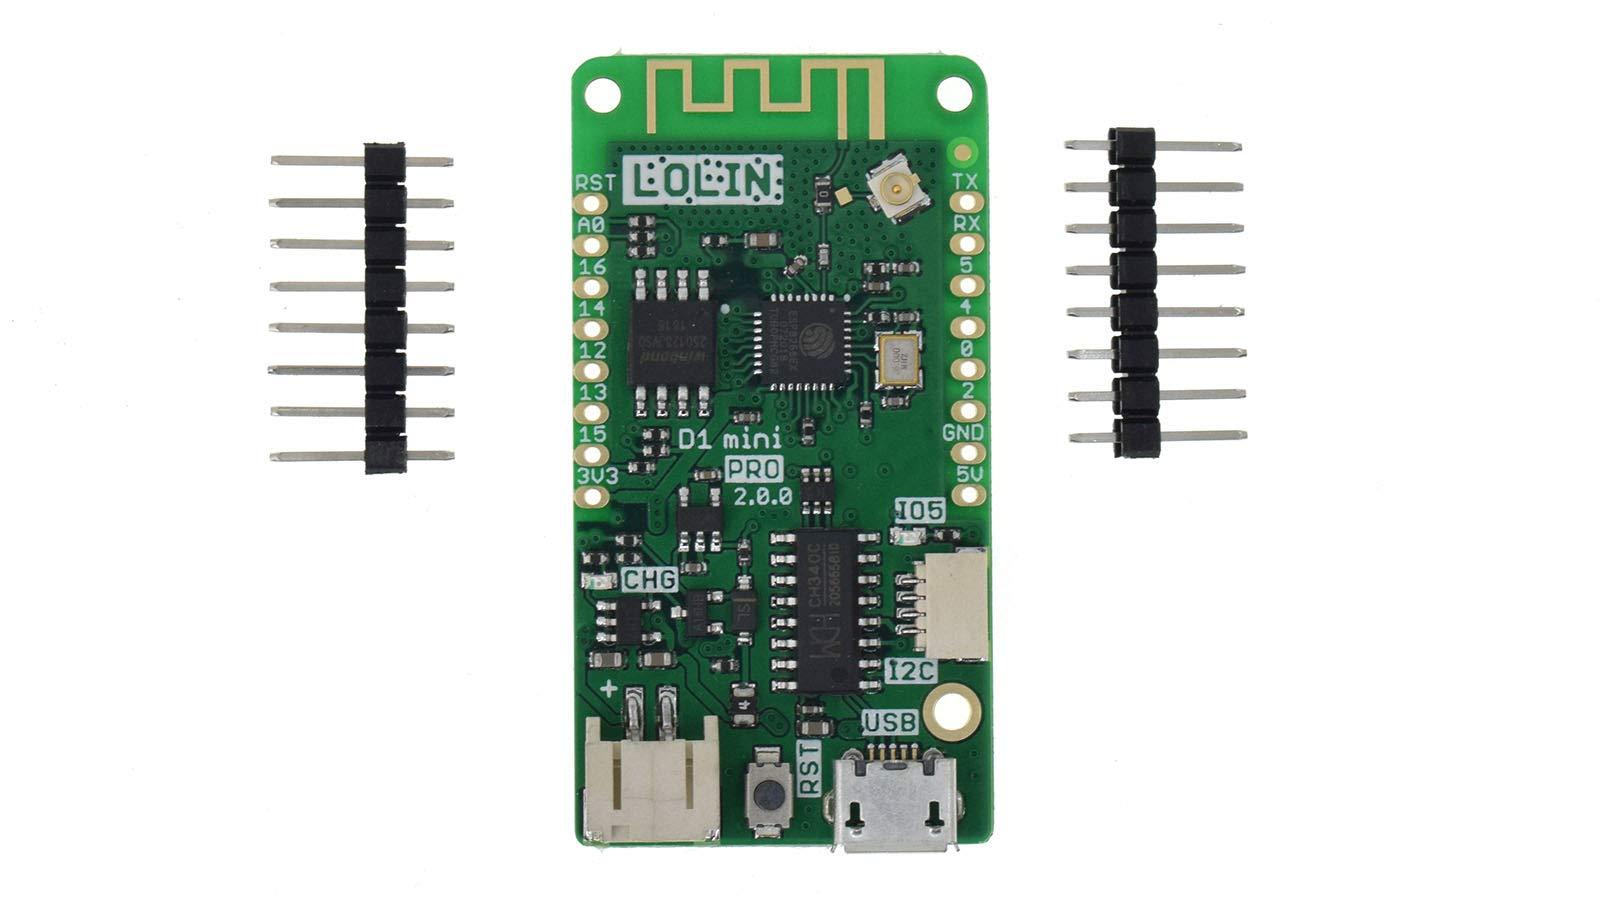 LOLIN D1 Mini Pro V2.0.0 WiFi IoT Development Board 16MB MicroPython Nodemcu Arduino